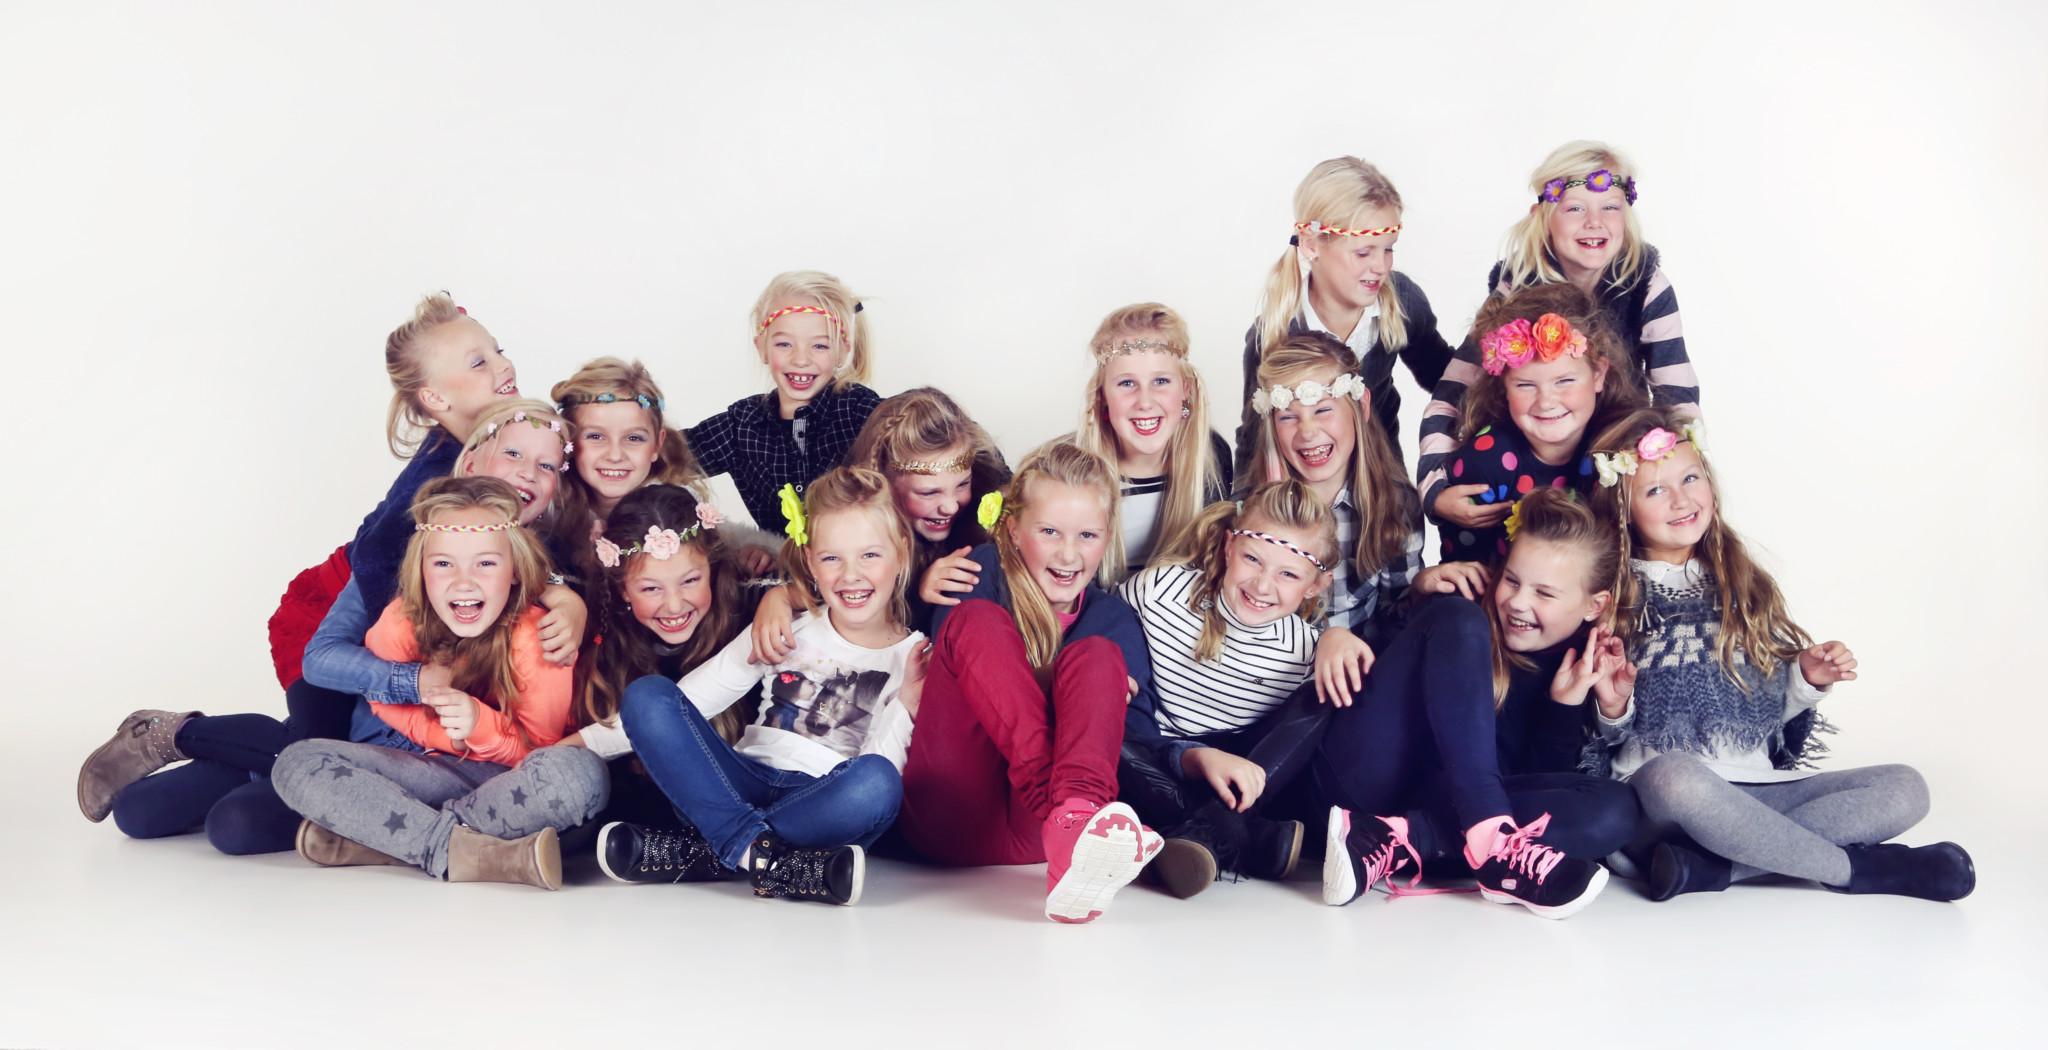 Kinderfeestje-Suus' FotoSjop